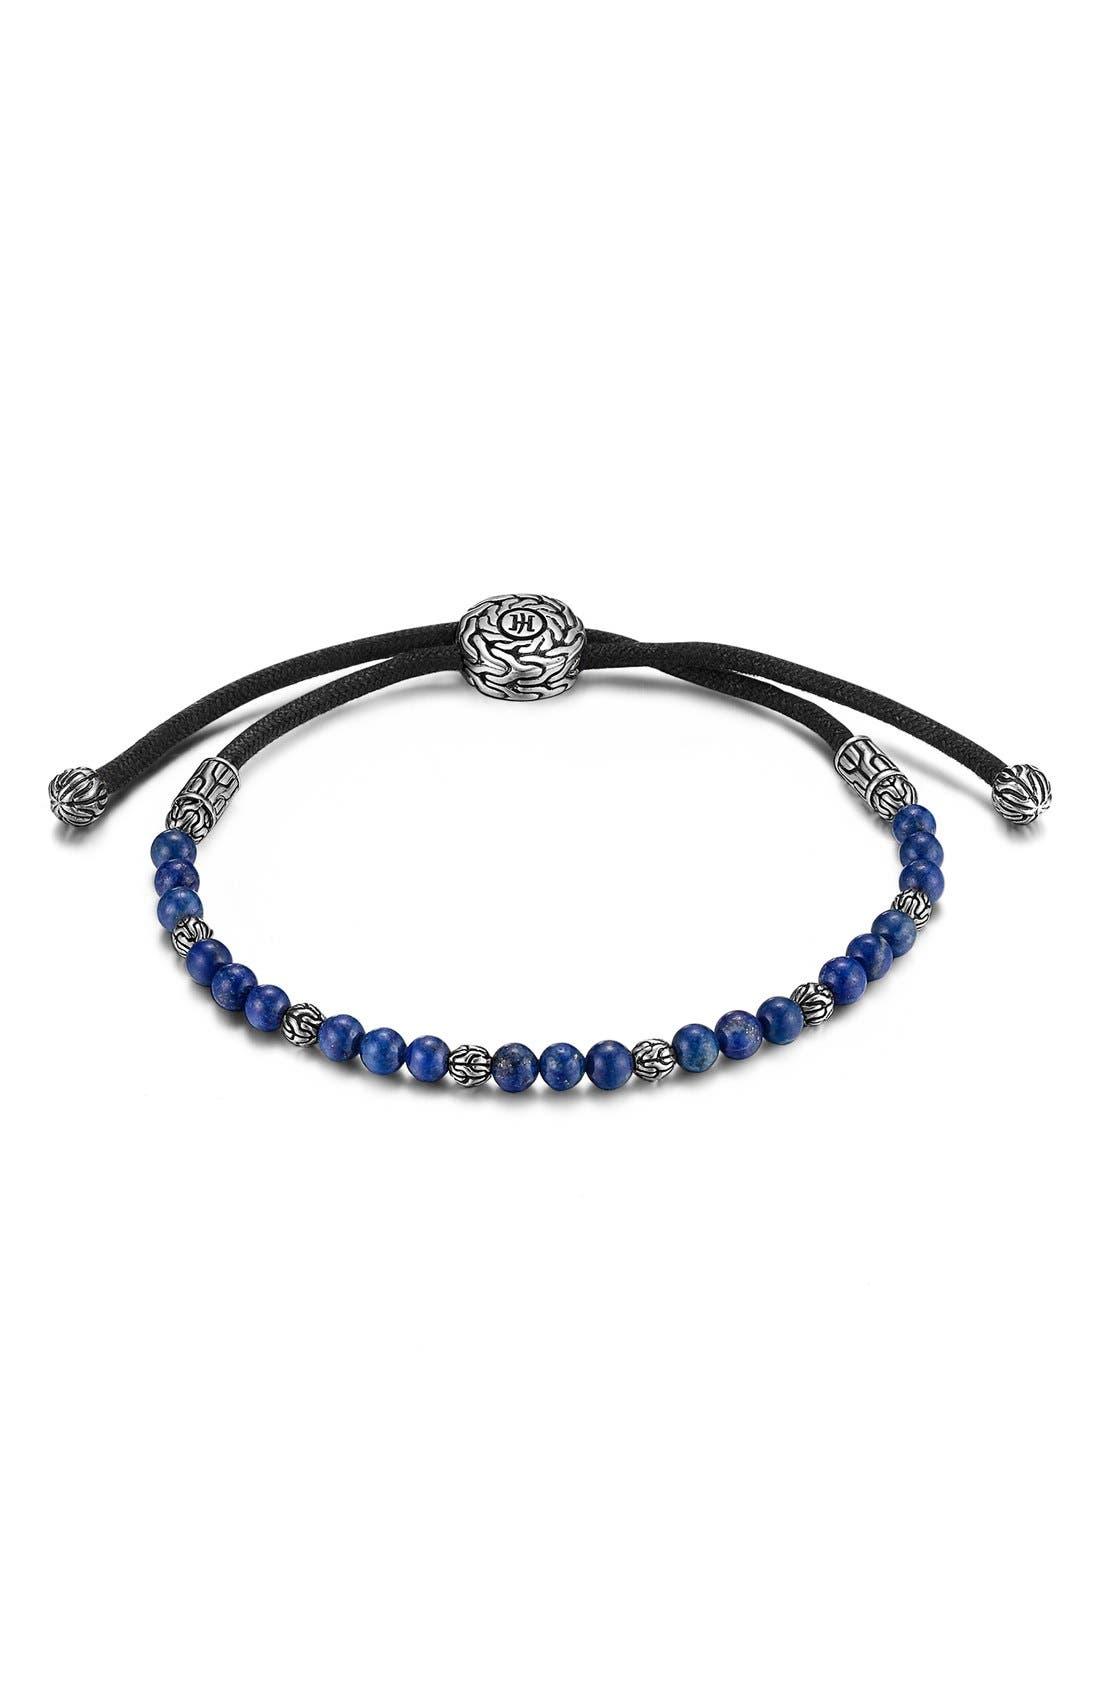 'Classic Chain' Beaded Friendship Bracelet,                             Main thumbnail 1, color,                             SILVER/ LAPIS LAZULI